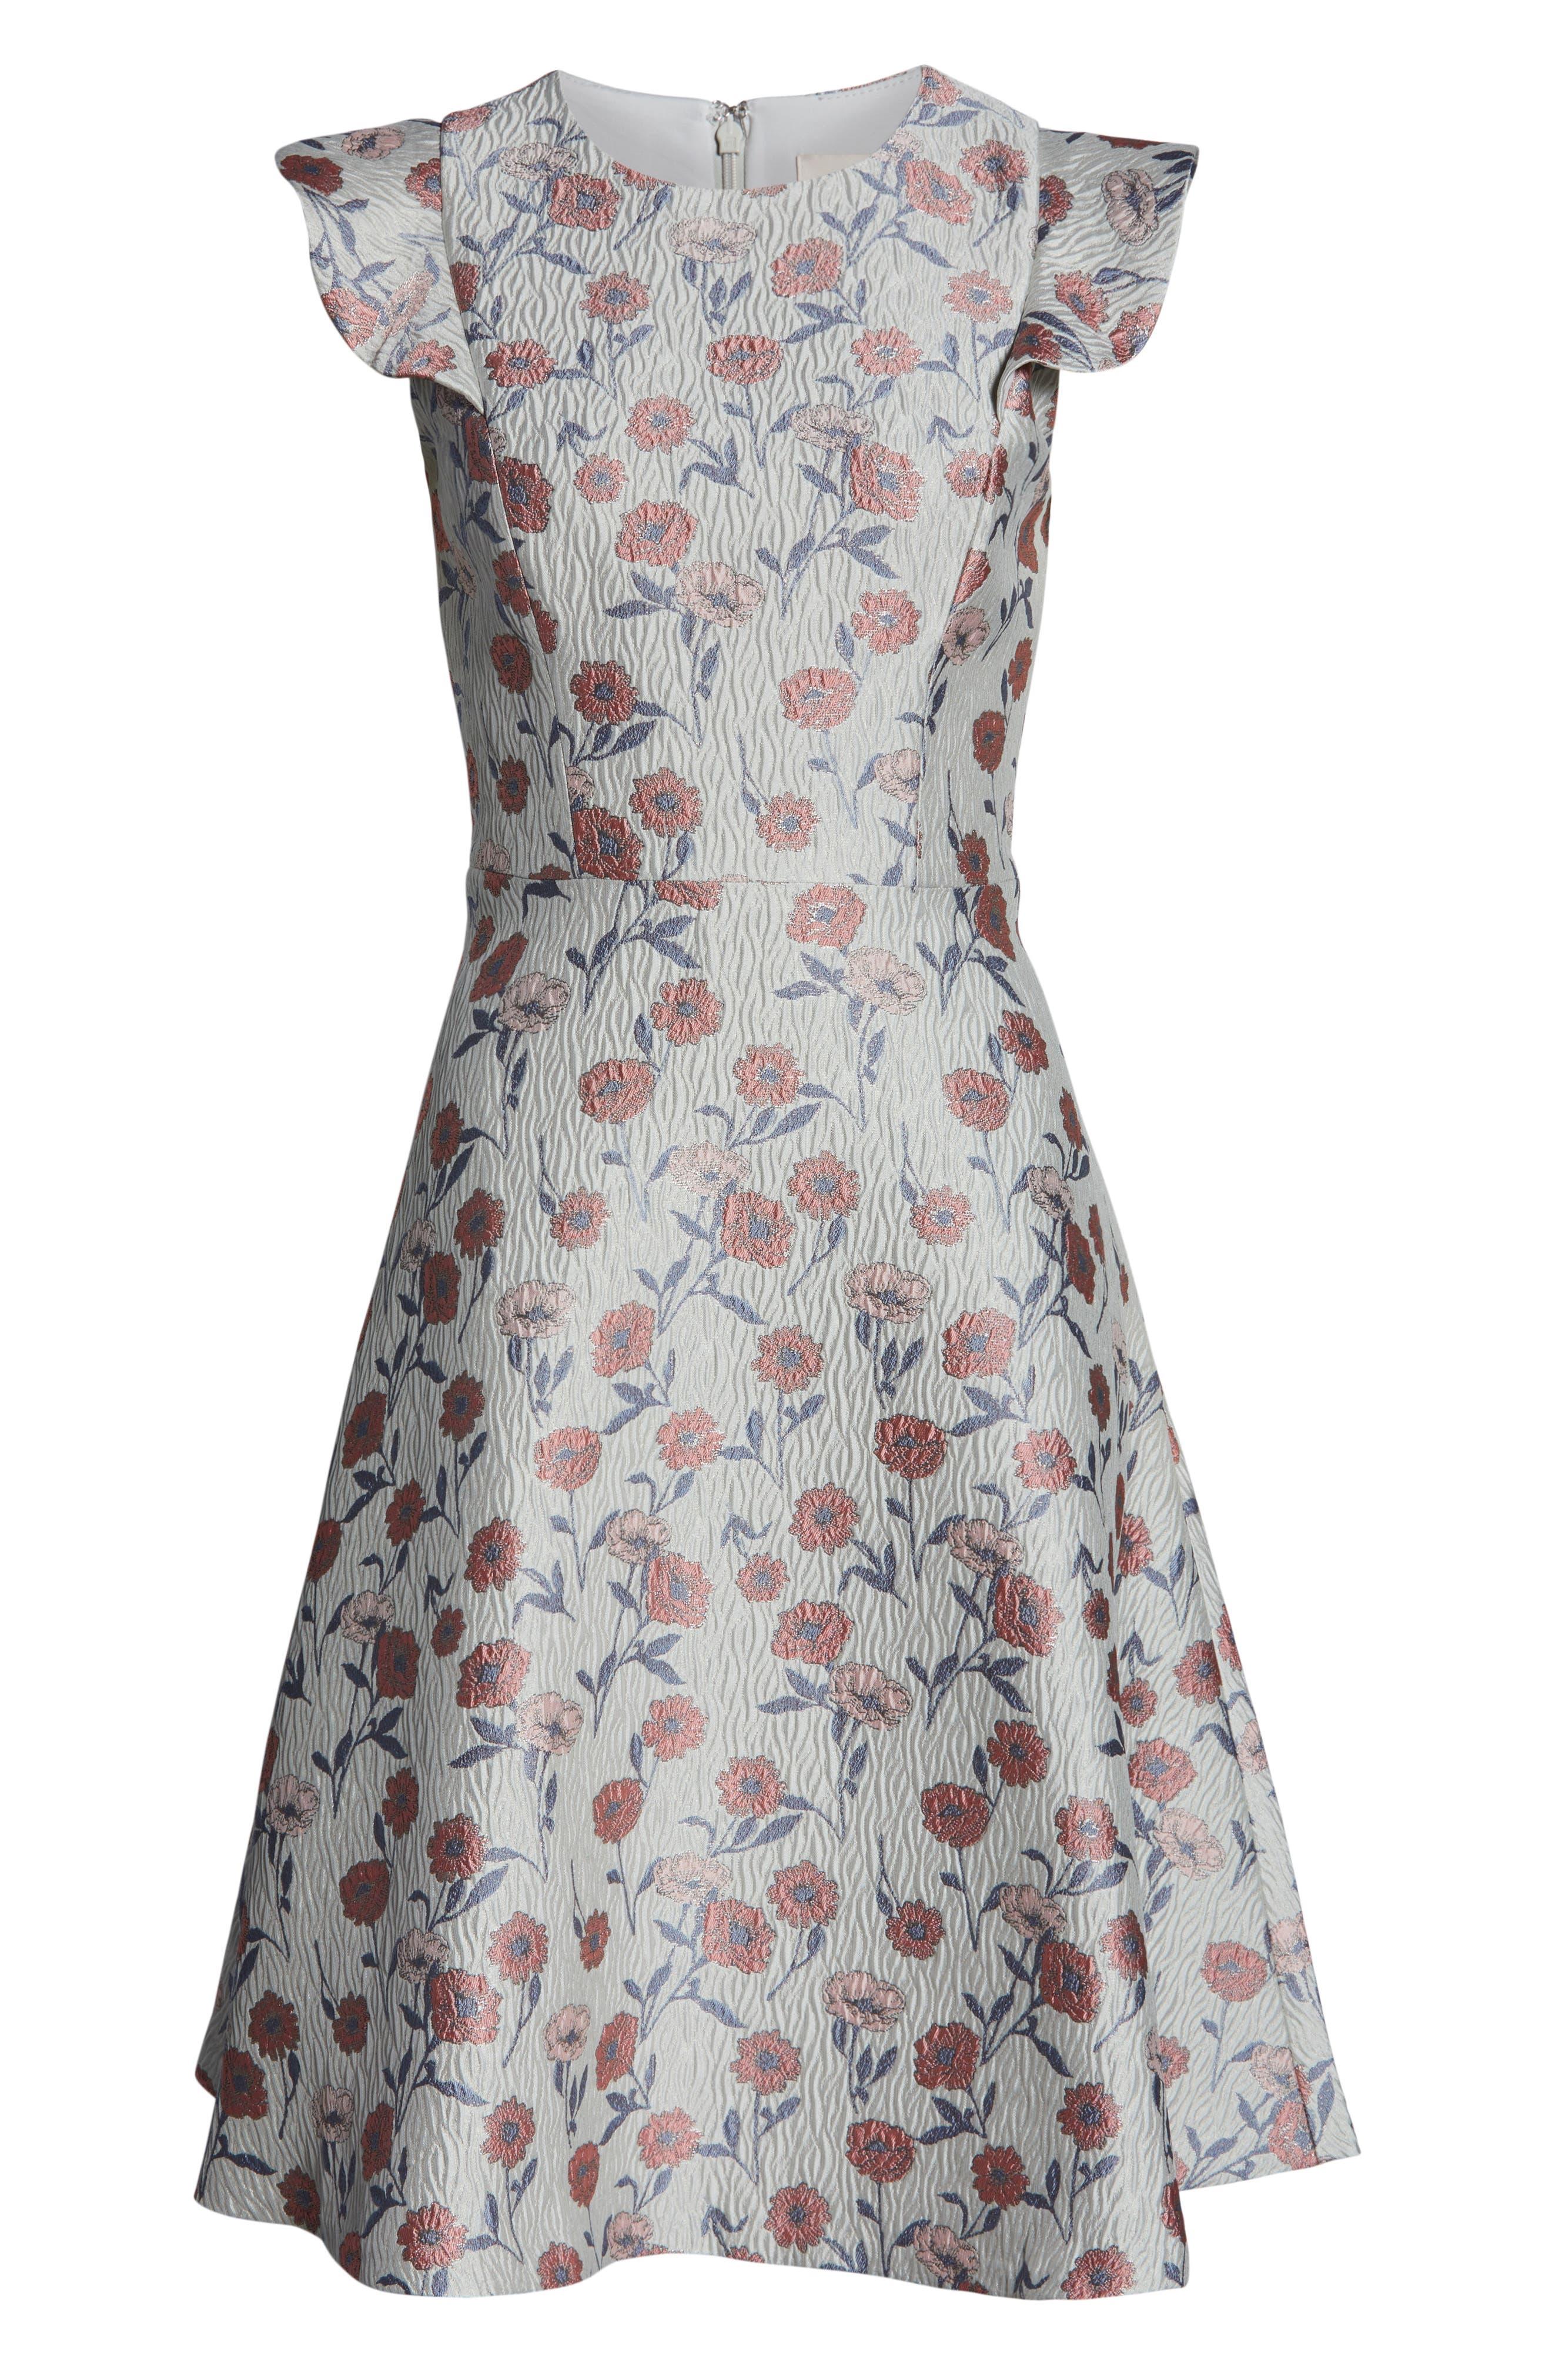 GAL MEETS GLAM COLLECTION, Lola Dancing Daisy Jacquard Dress, Alternate thumbnail 5, color, 650